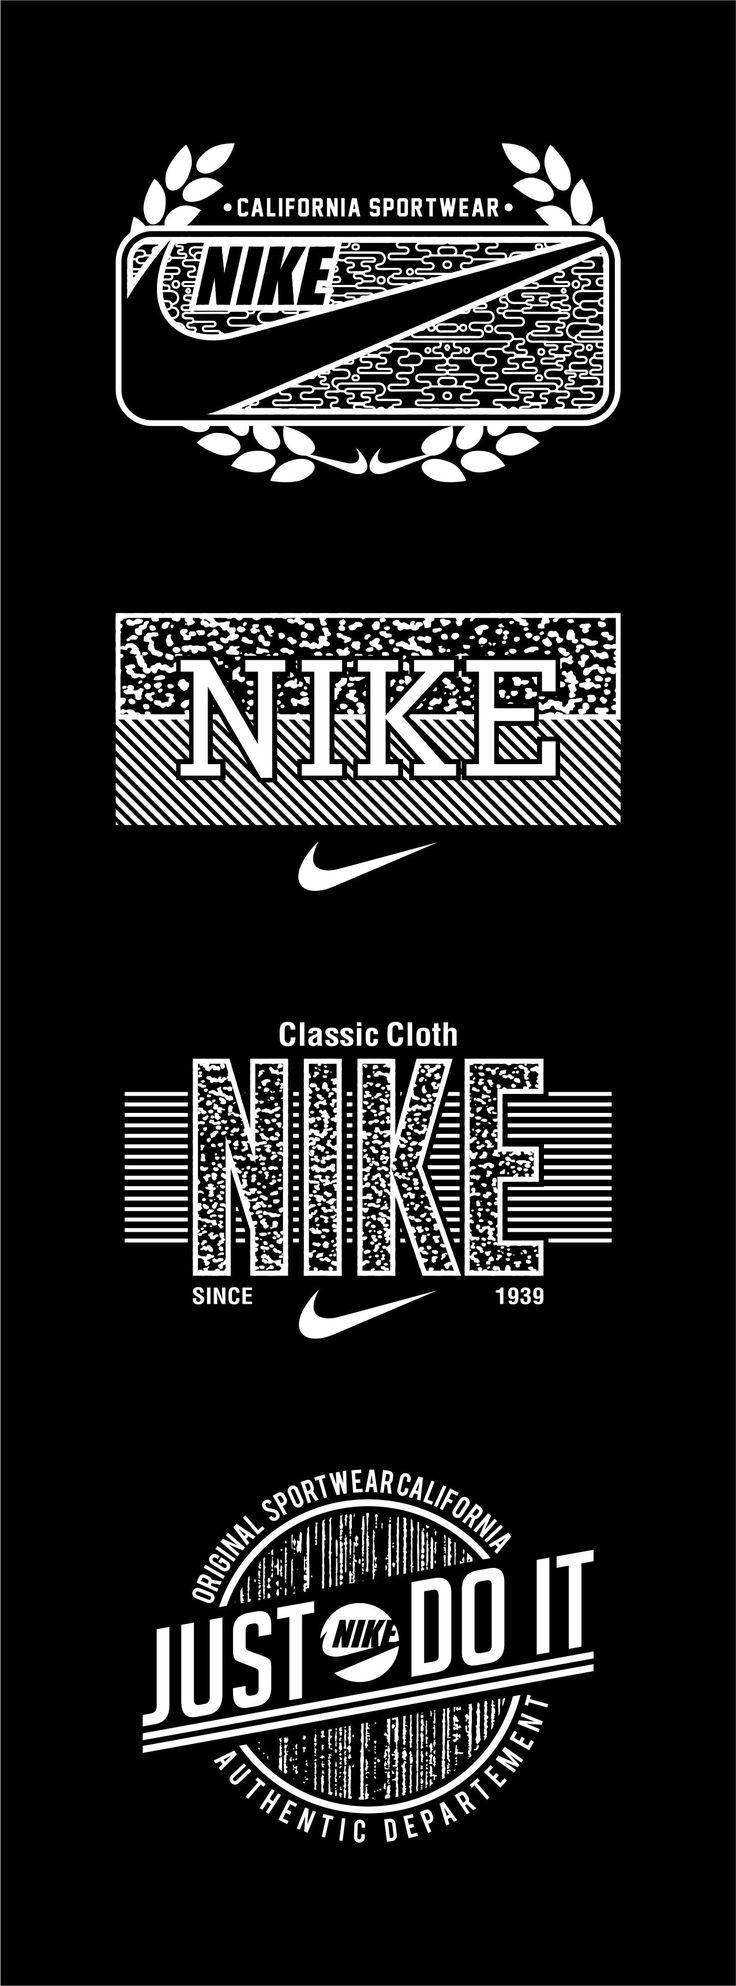 Vintage Nike #vintage #vector #vintagevector #volcom #adidas #billabong #rusty #nike #puma #levis #quiksilver #ripcurl #dc #vans #spyderbilt #reebok